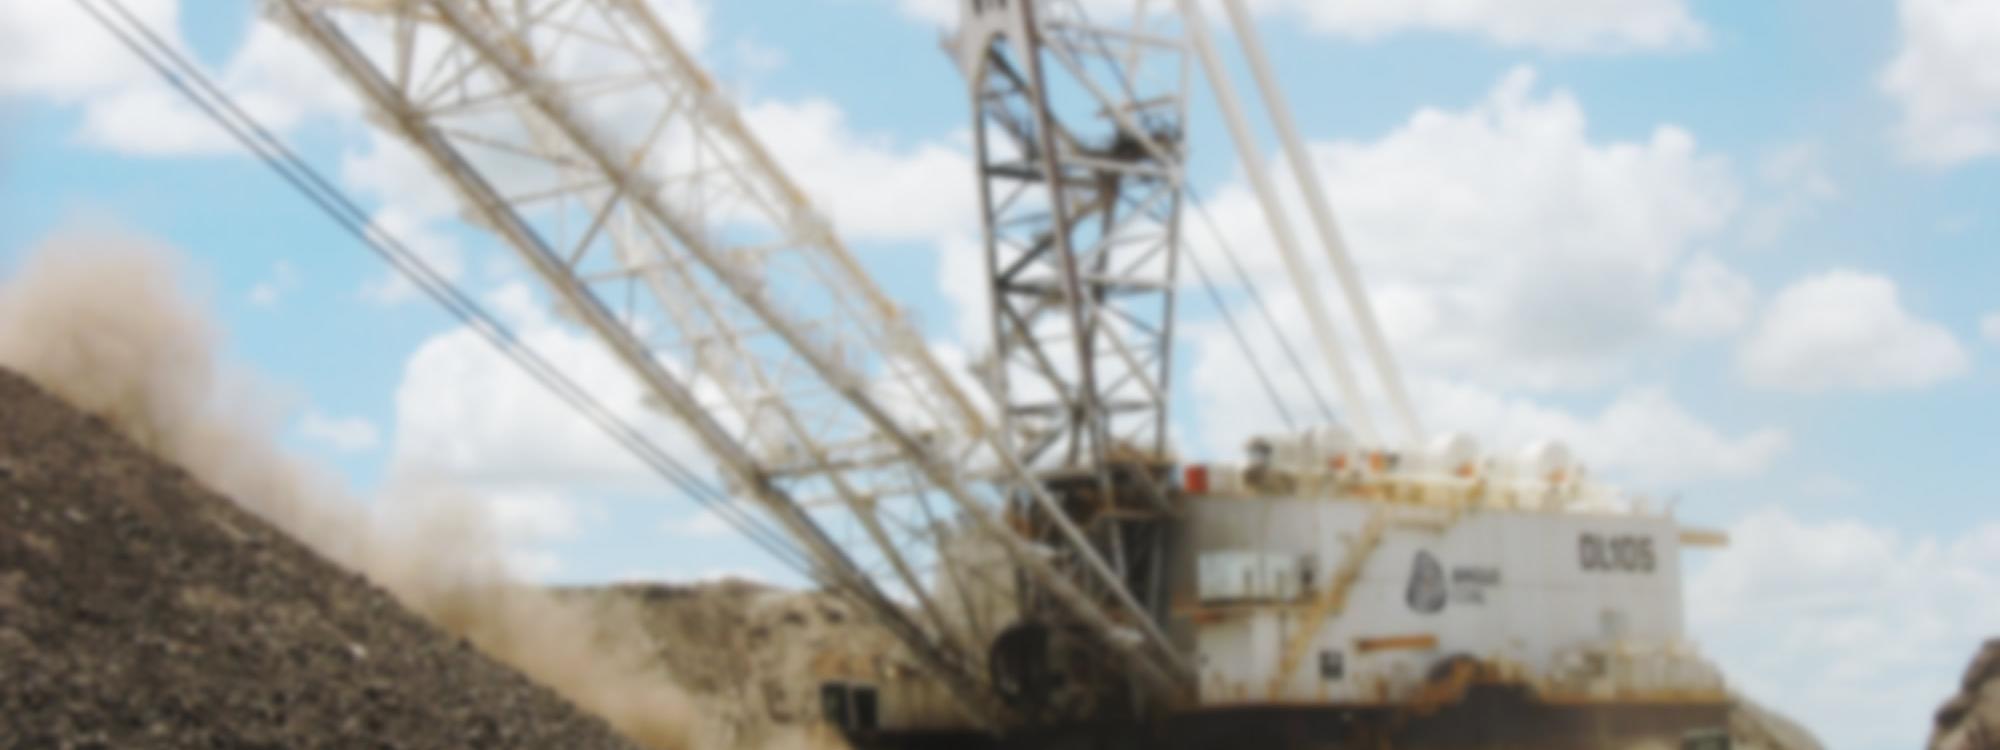 Dragline working Anglo Coal blurred